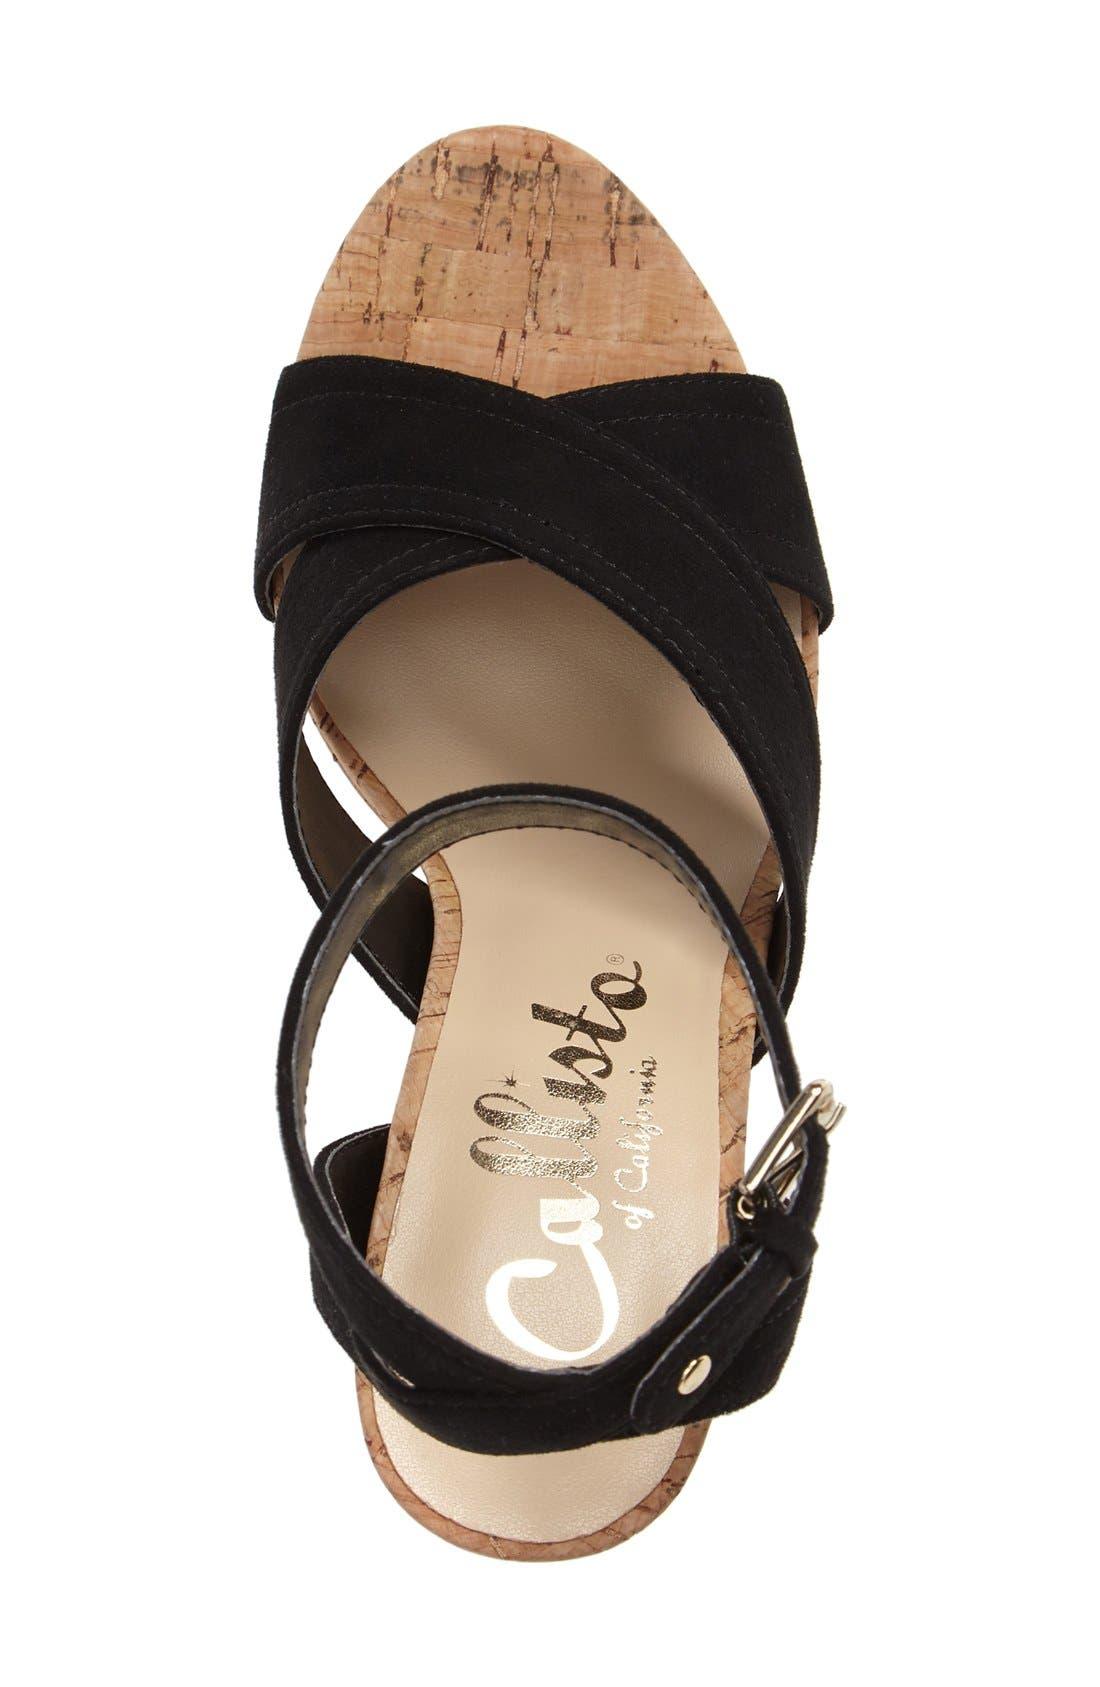 Windye Platform Ankle Strap Sandal,                             Alternate thumbnail 6, color,                             003